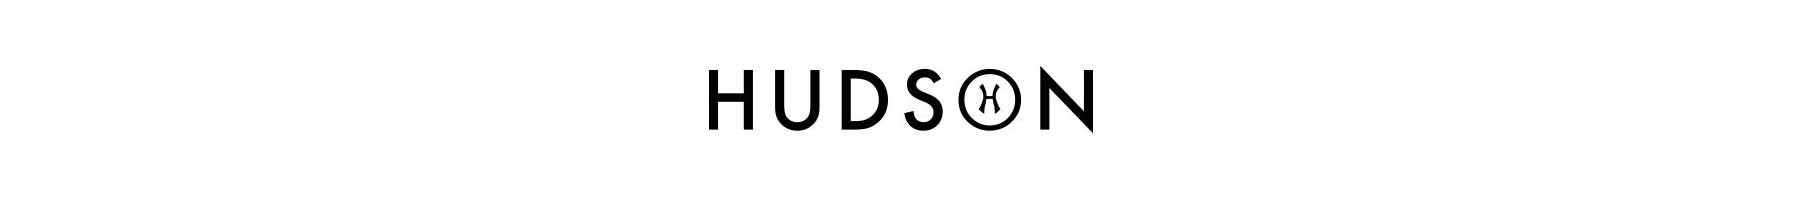 DrJays.com - Hudson NYC